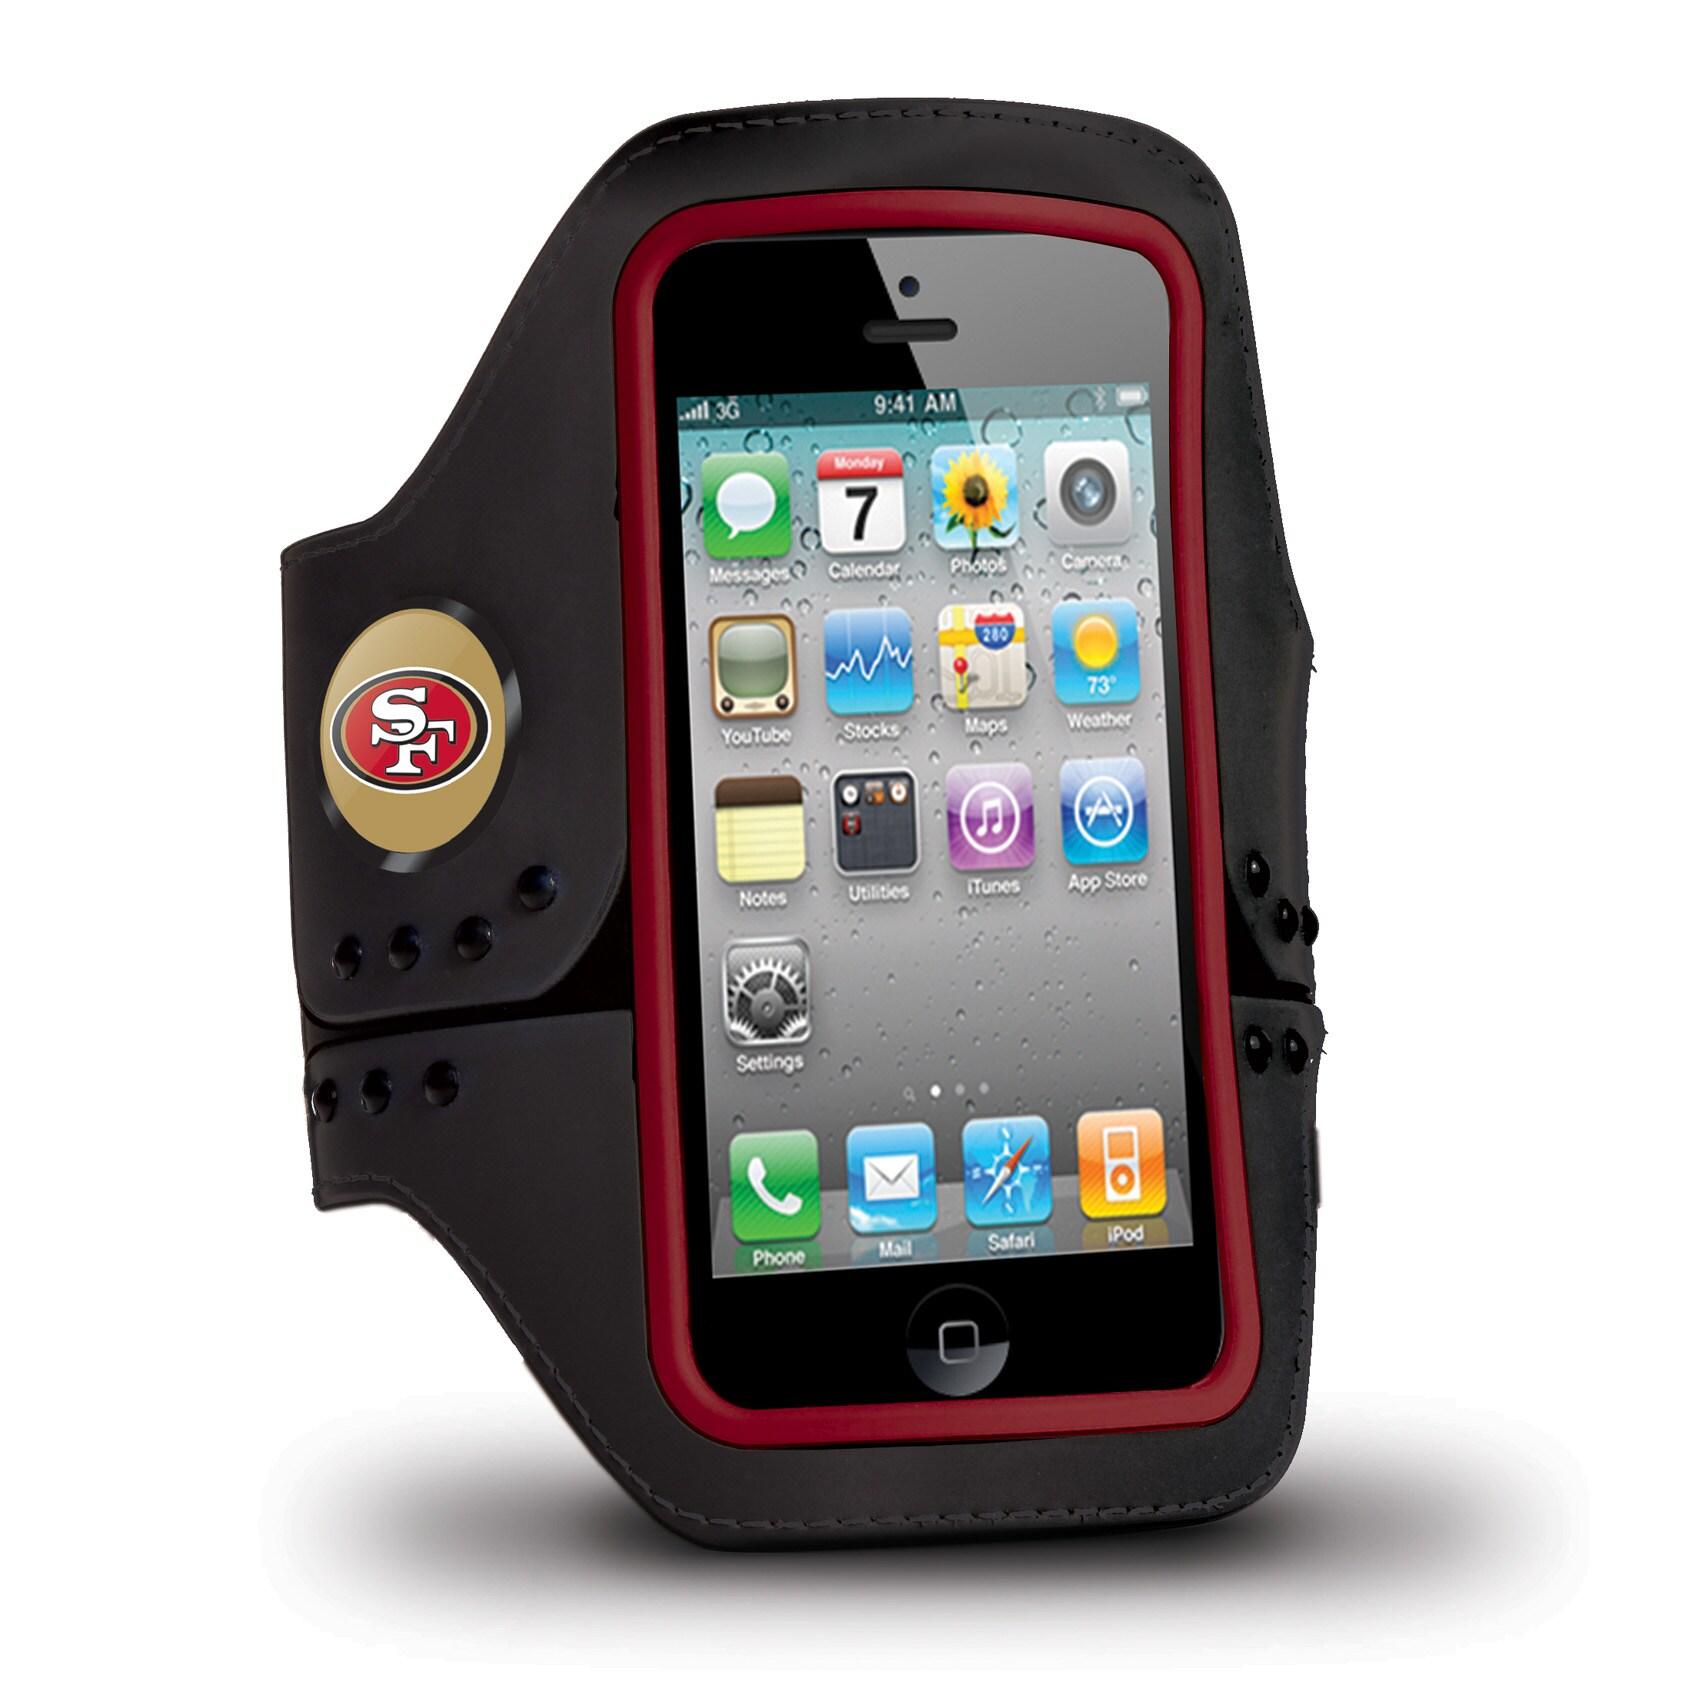 San Francisco 49ers Armor Band Phone Case